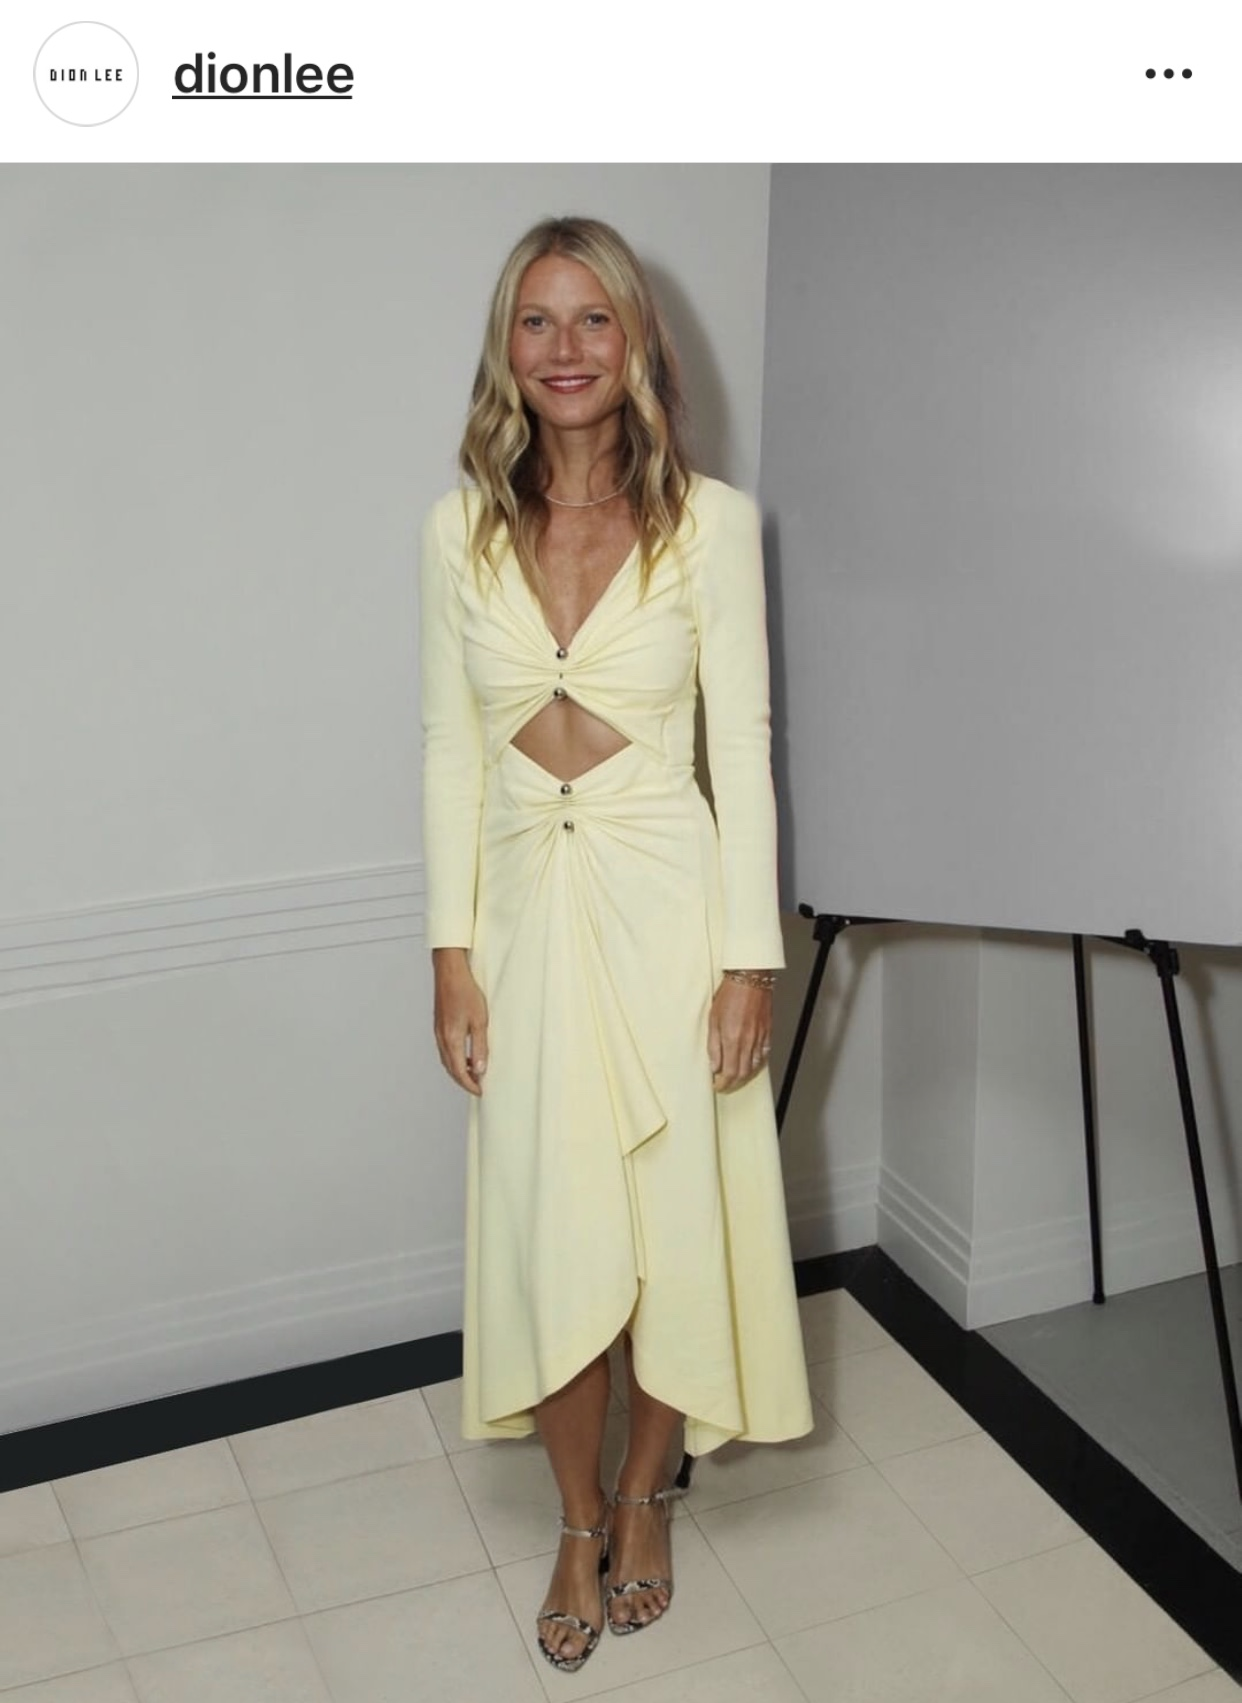 Gwyneth-Paltrow-in Dion-Lee -best-dressedjpg